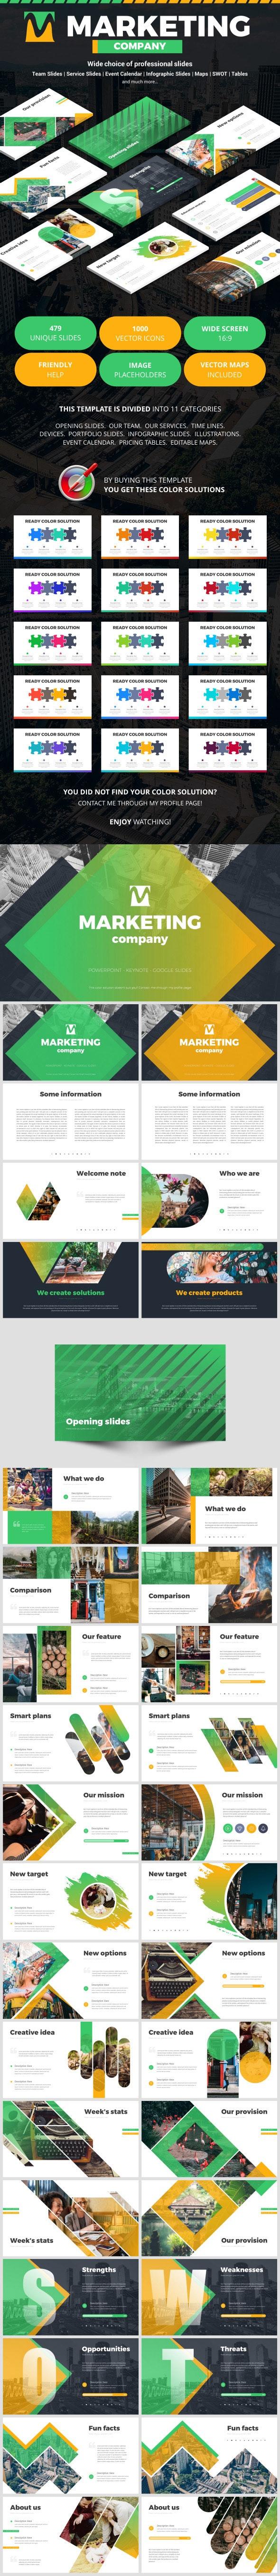 Marketing Company - Google Slides Presentation Templates